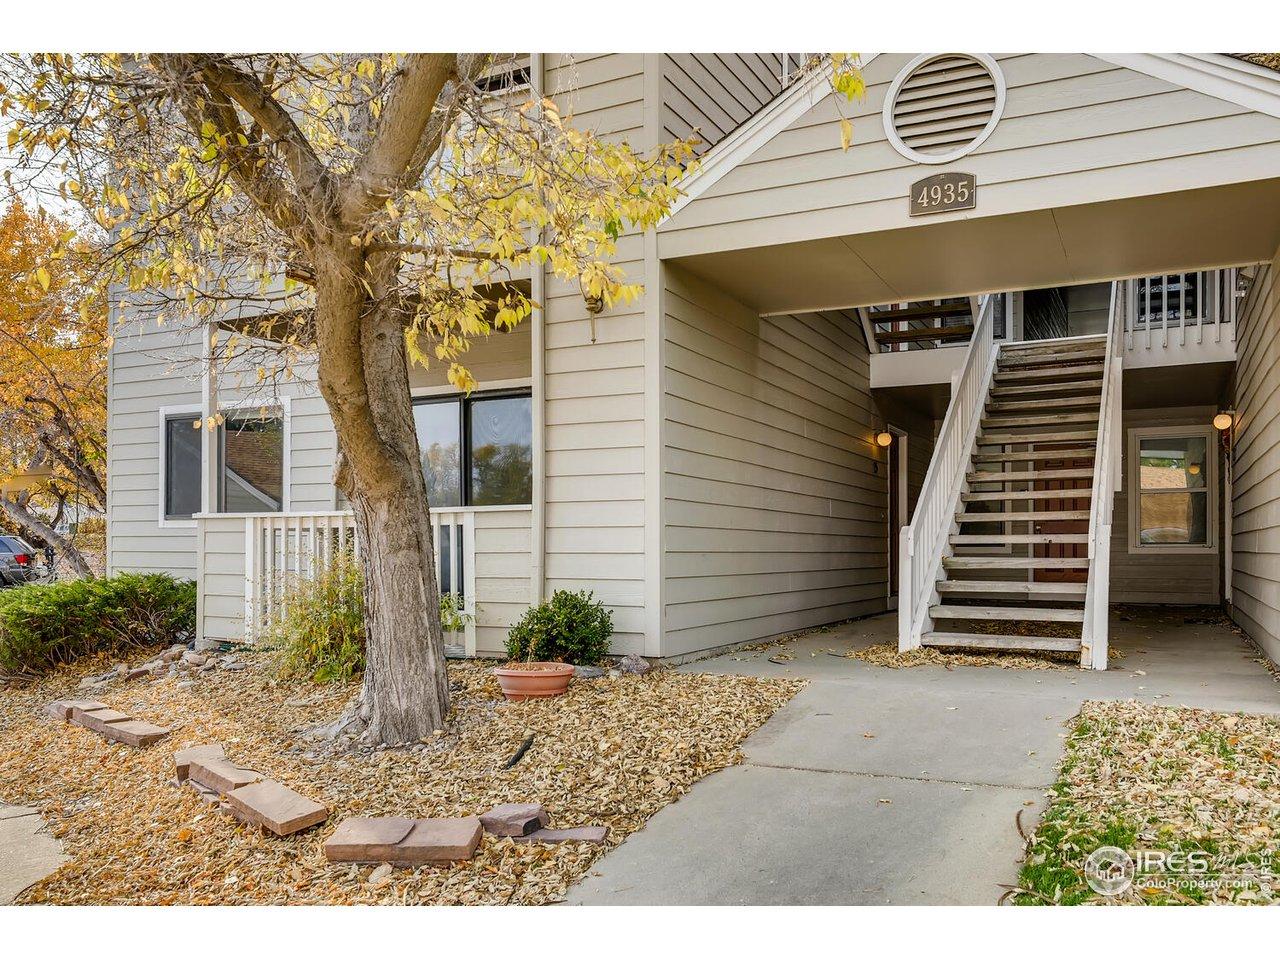 4935 Twin Lakes Rd 25, Boulder CO 80301